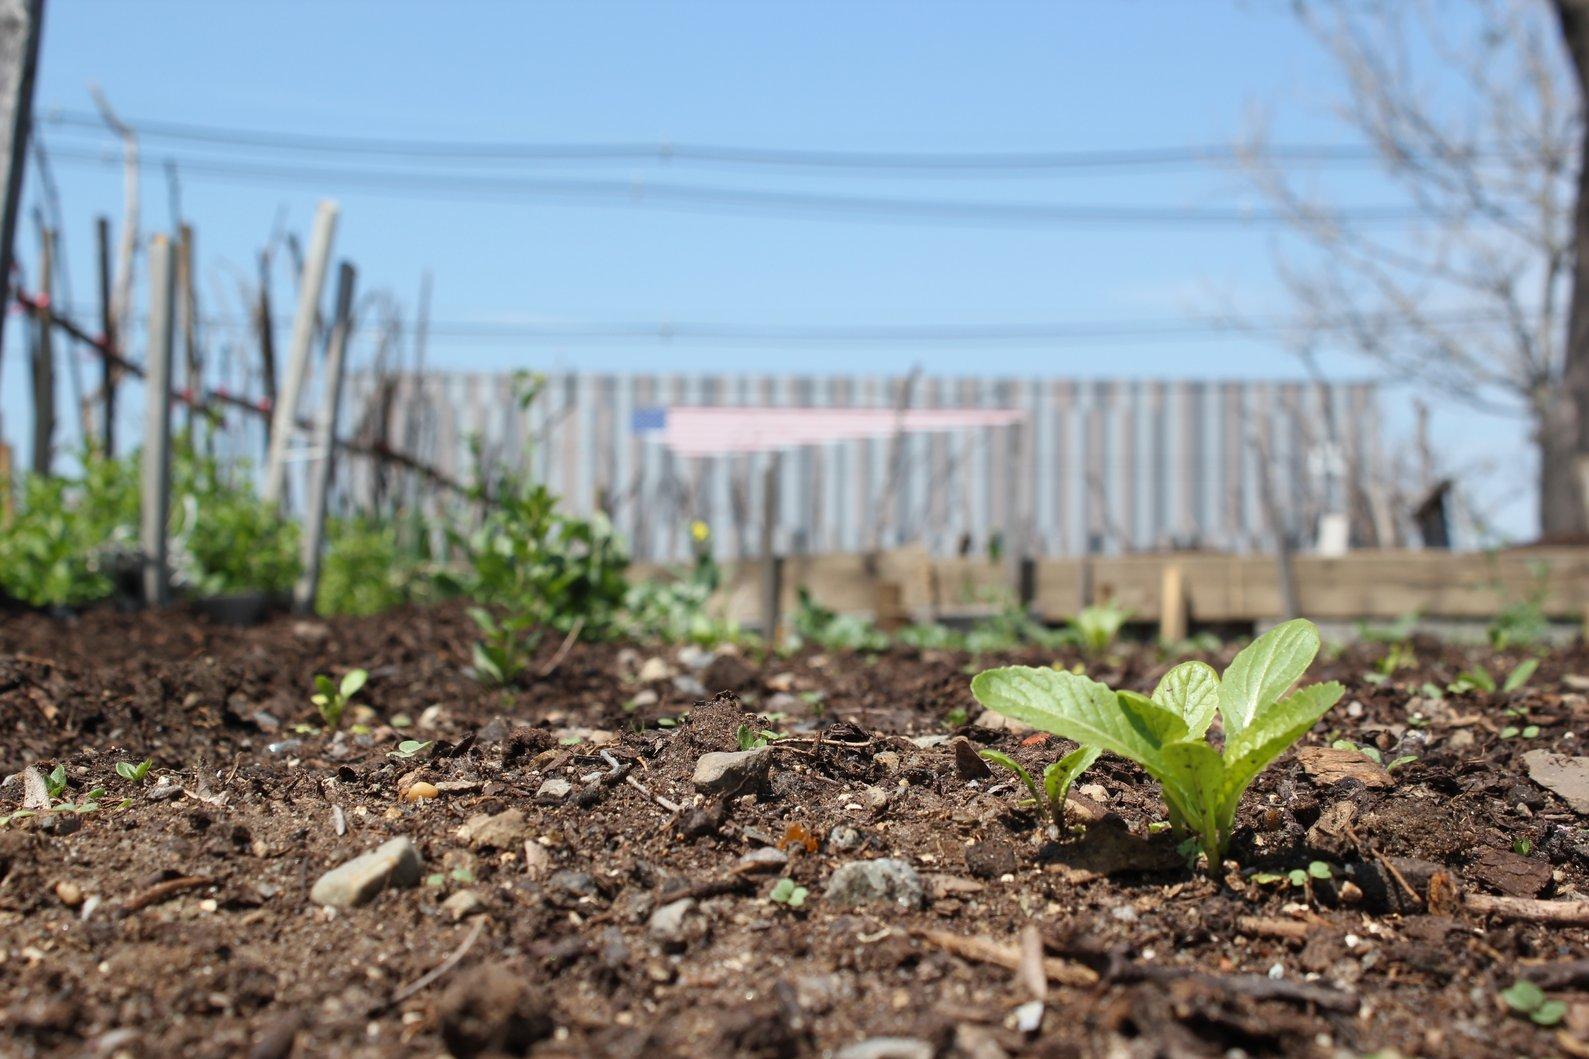 Some Boston Organics staff enjoy walking around the community garden across the street.